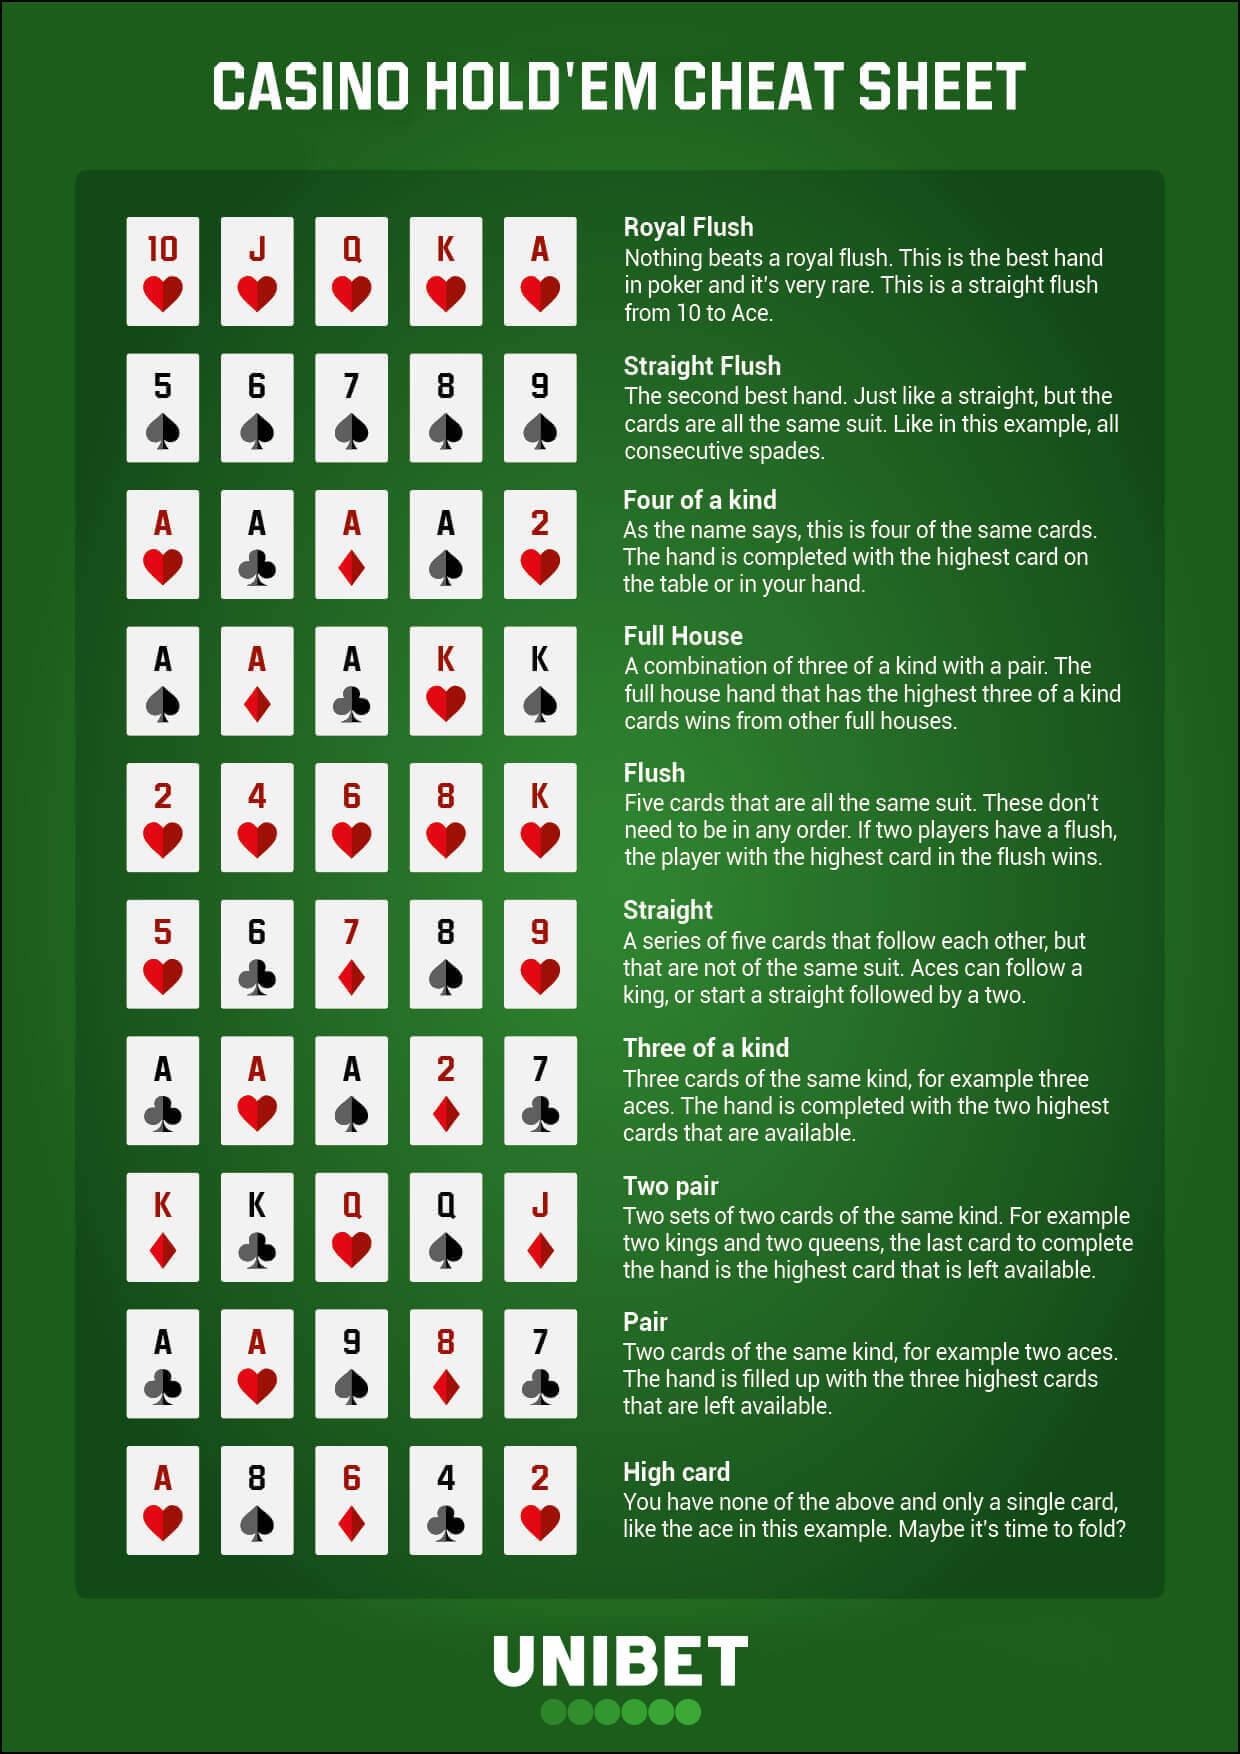 casino hold em cheat sheet uk